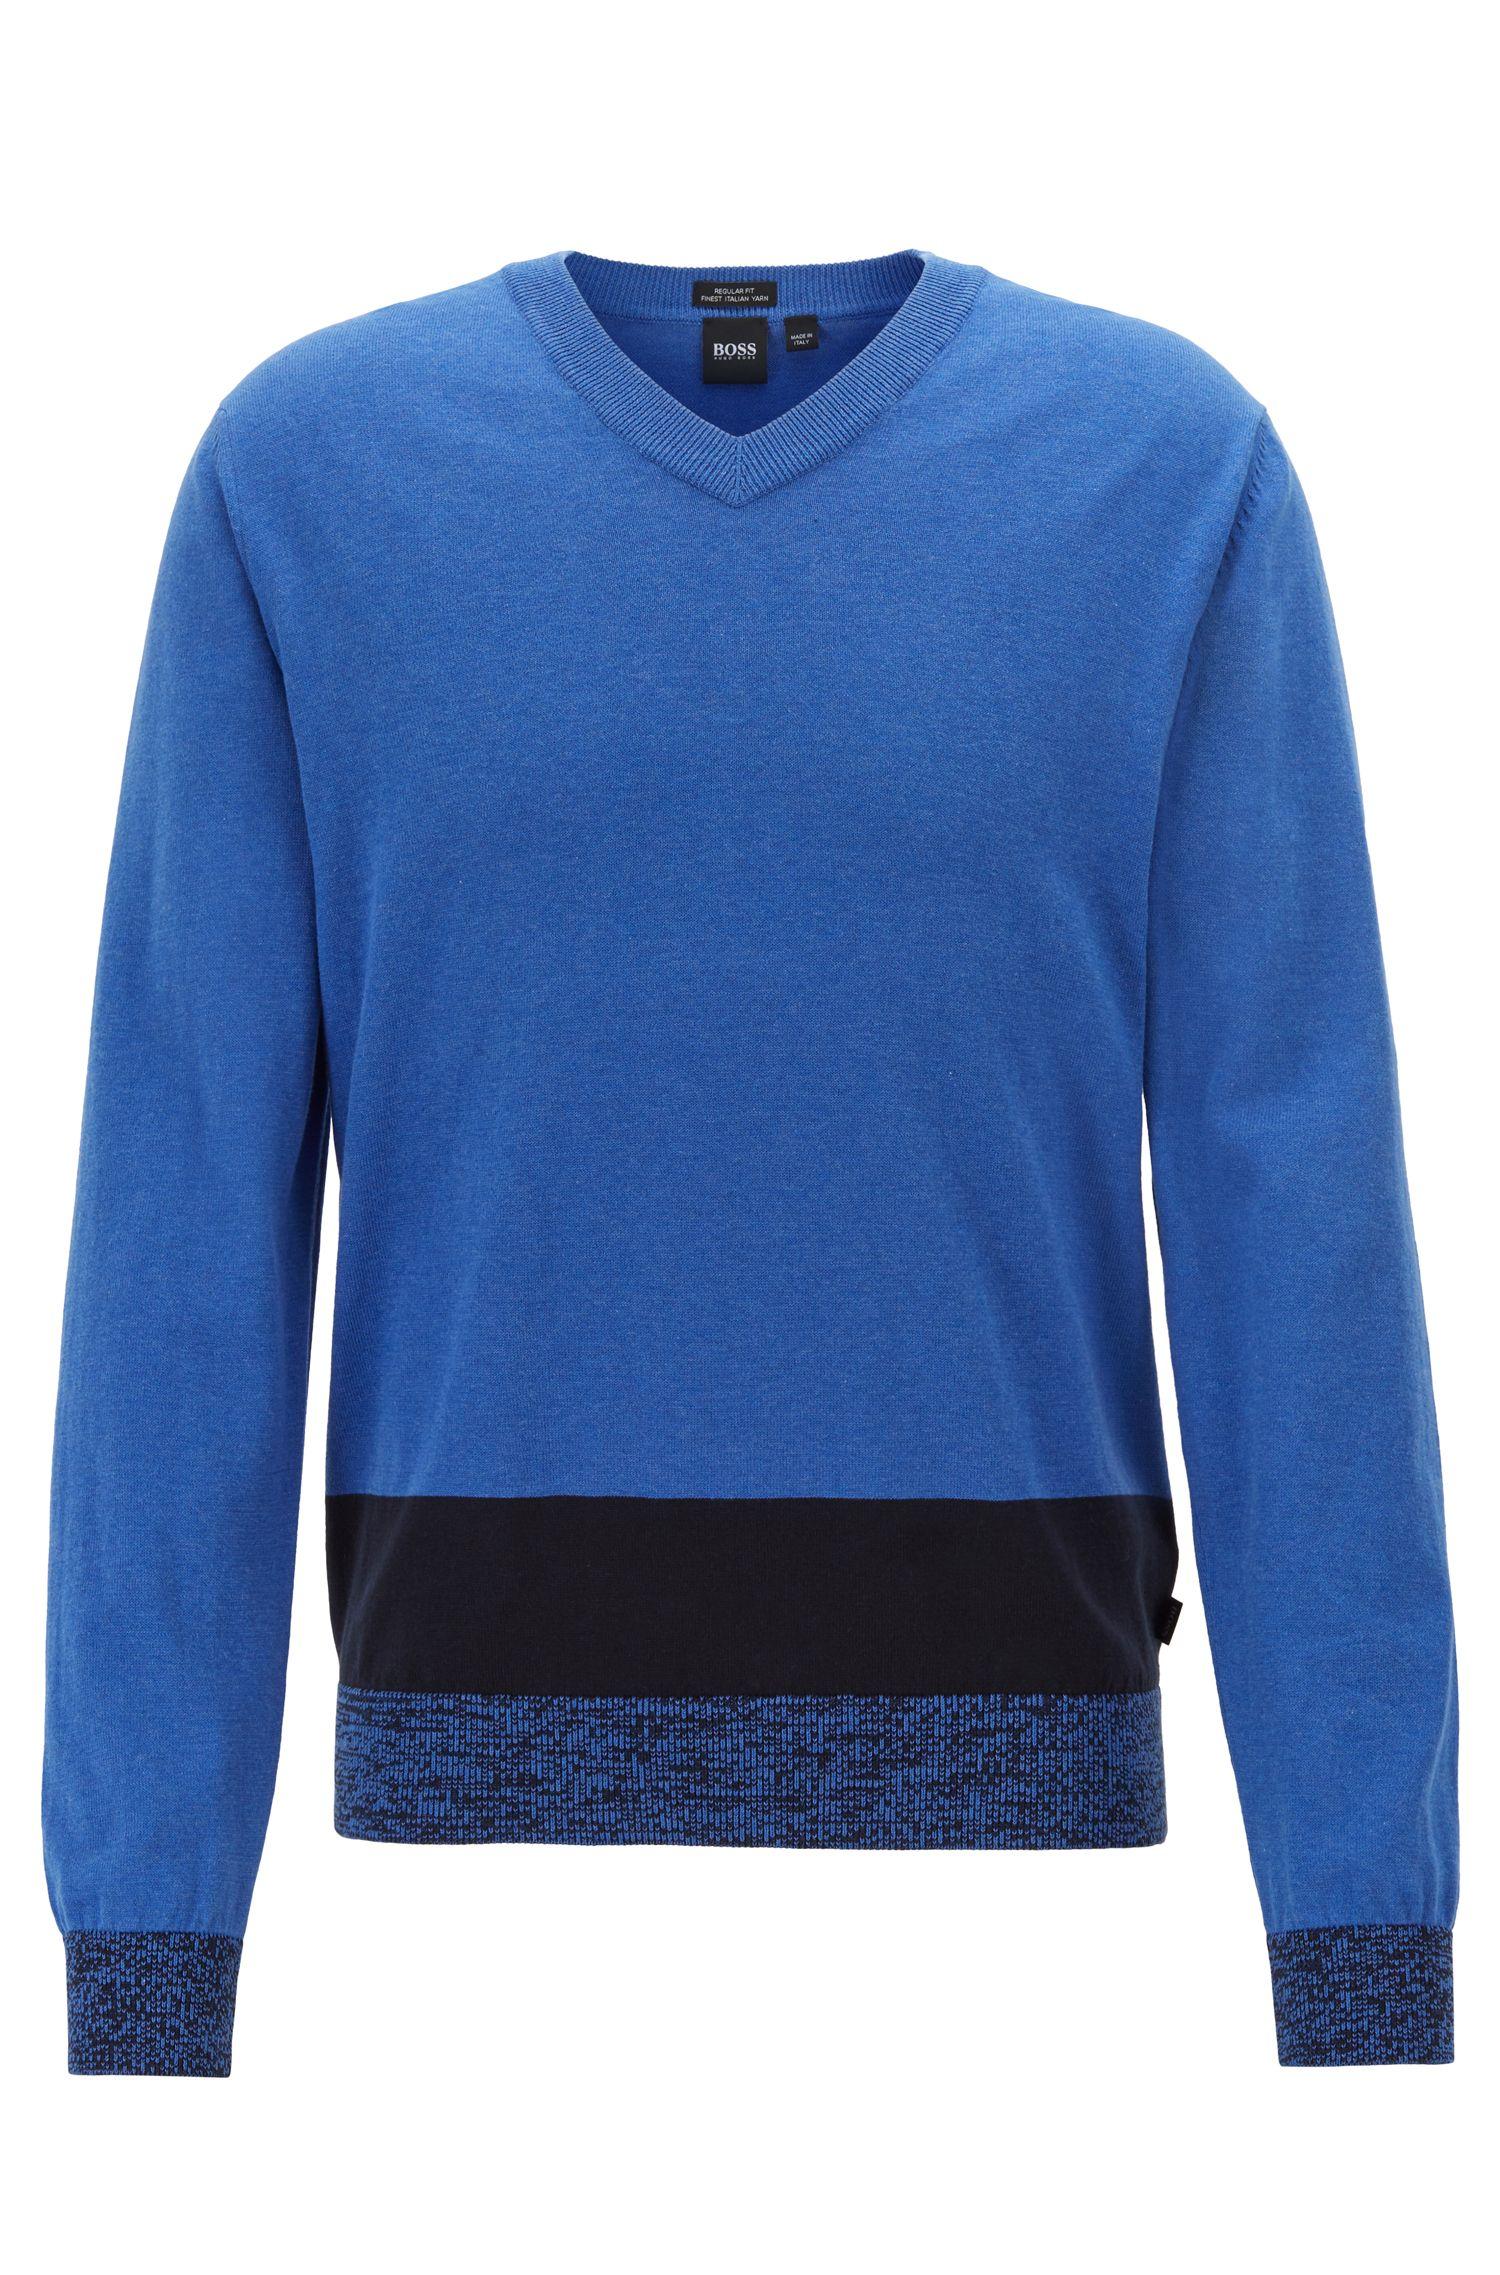 V-neck sweater in Italian Pima cotton with colourblock hem, Blue